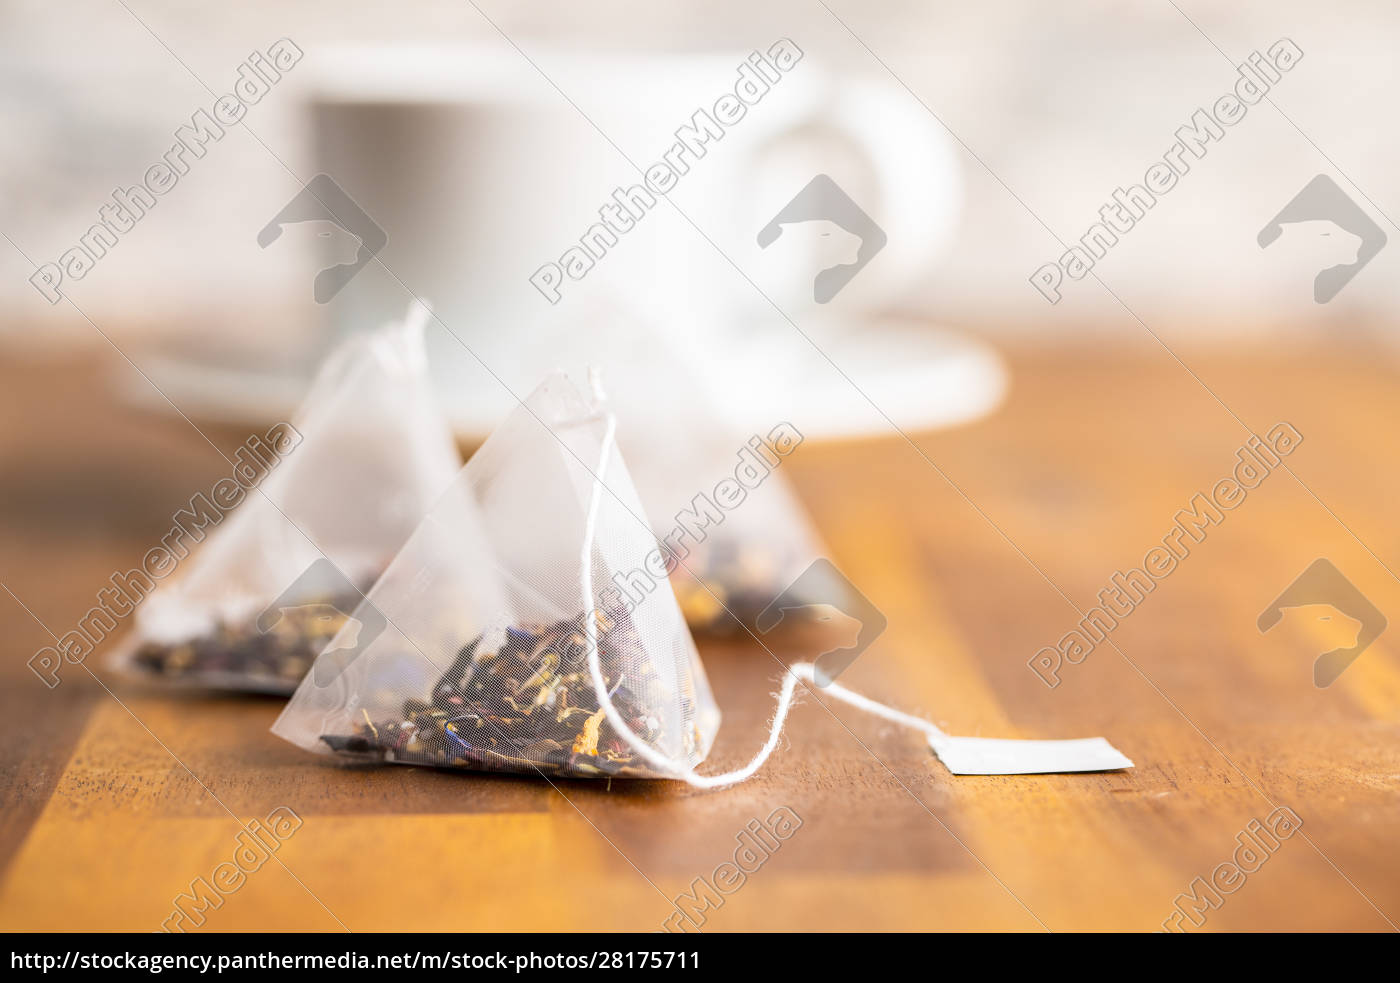 floral, tea, bag - 28175711